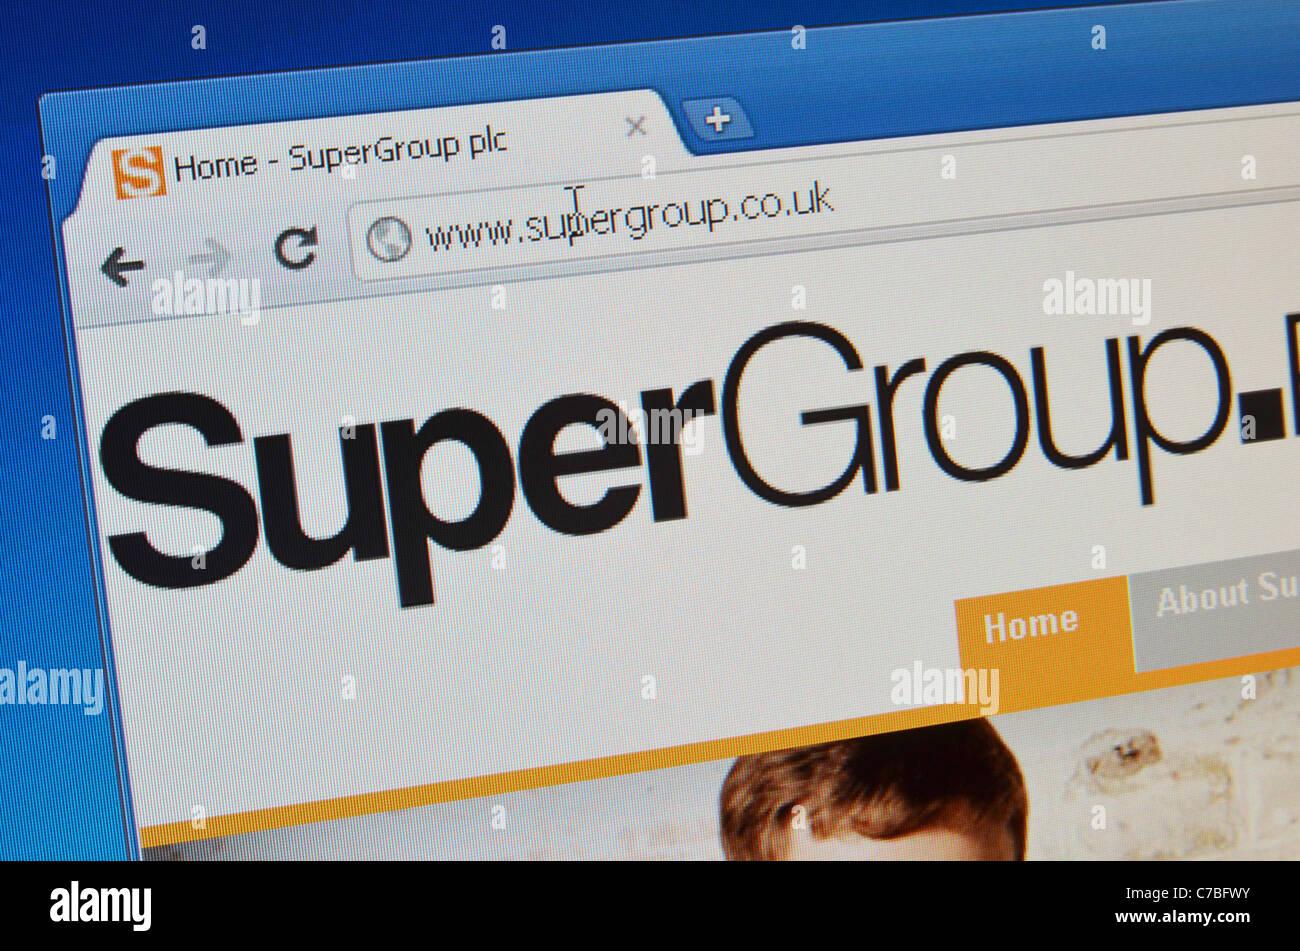 Supergroup website screenshot - Stock Image